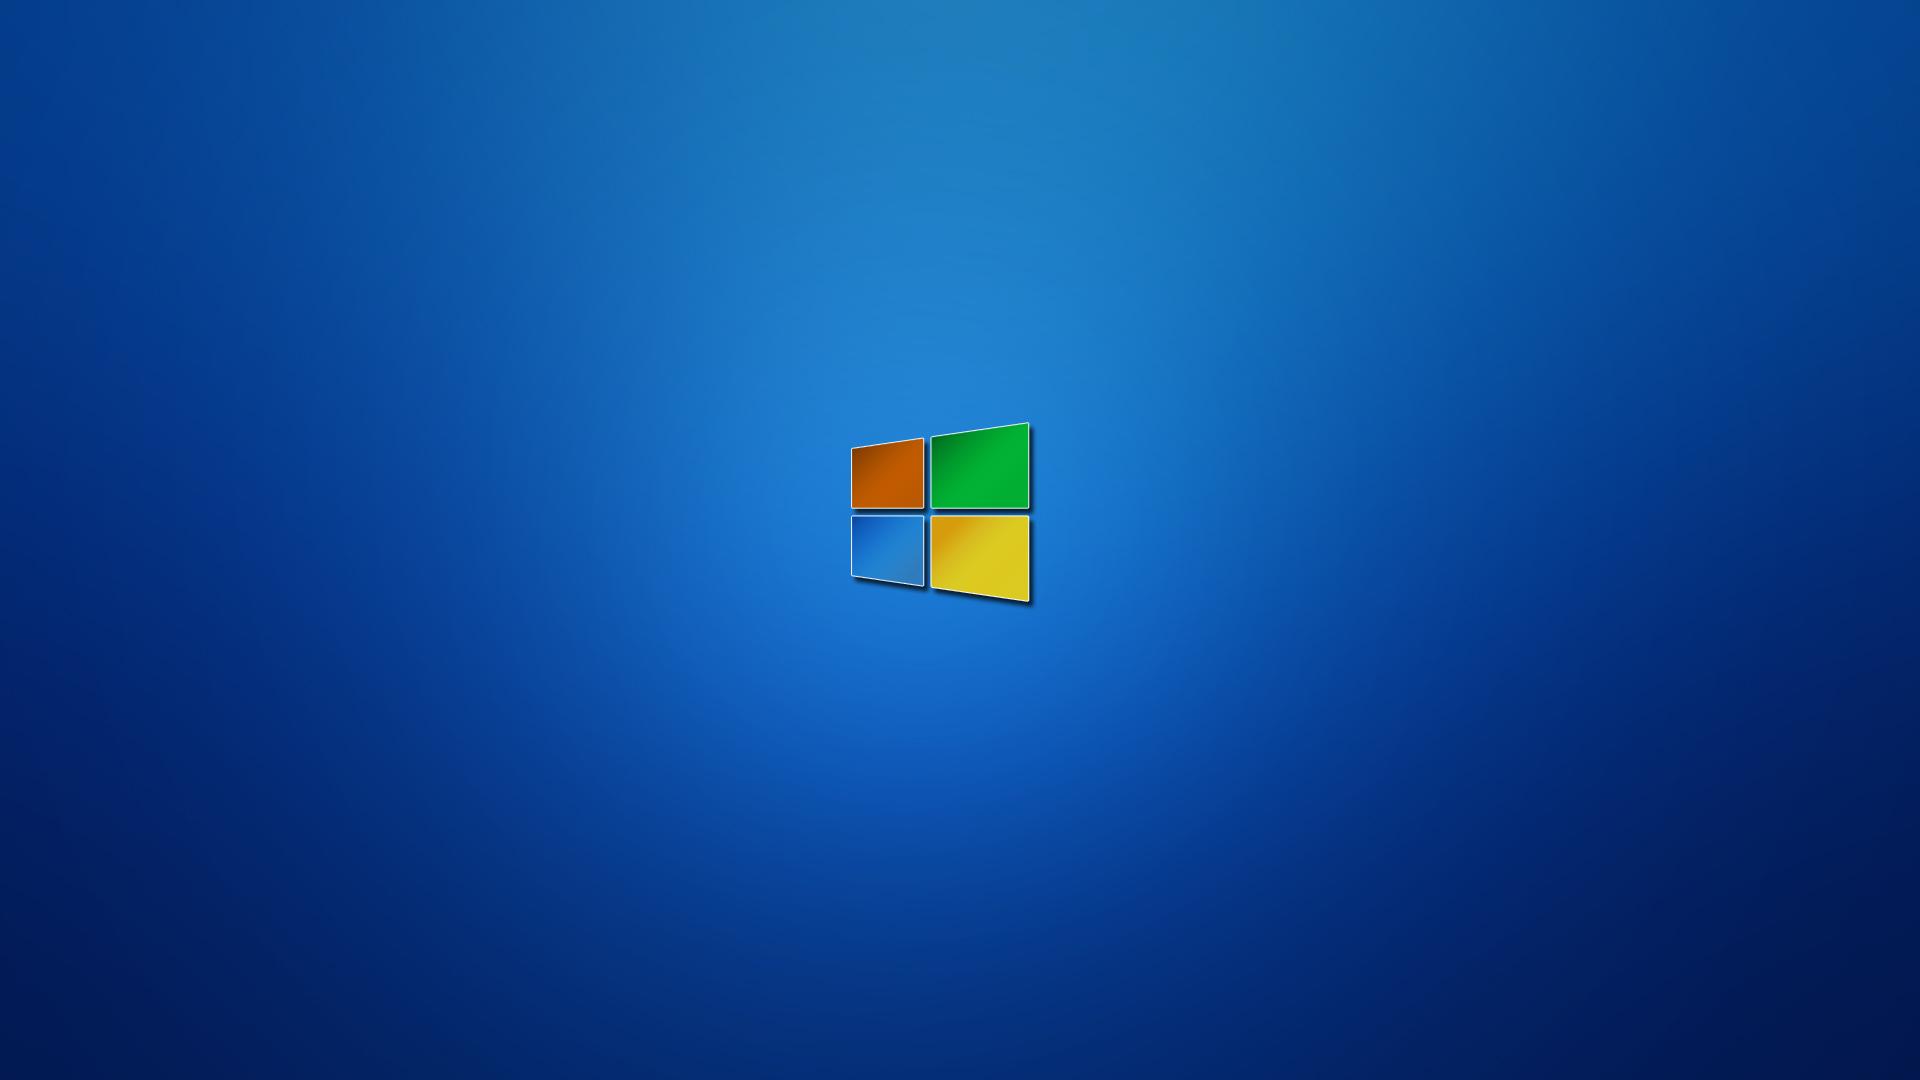 hd desktop wallpapers for windows 10,blue,operating system,azure,logo,font